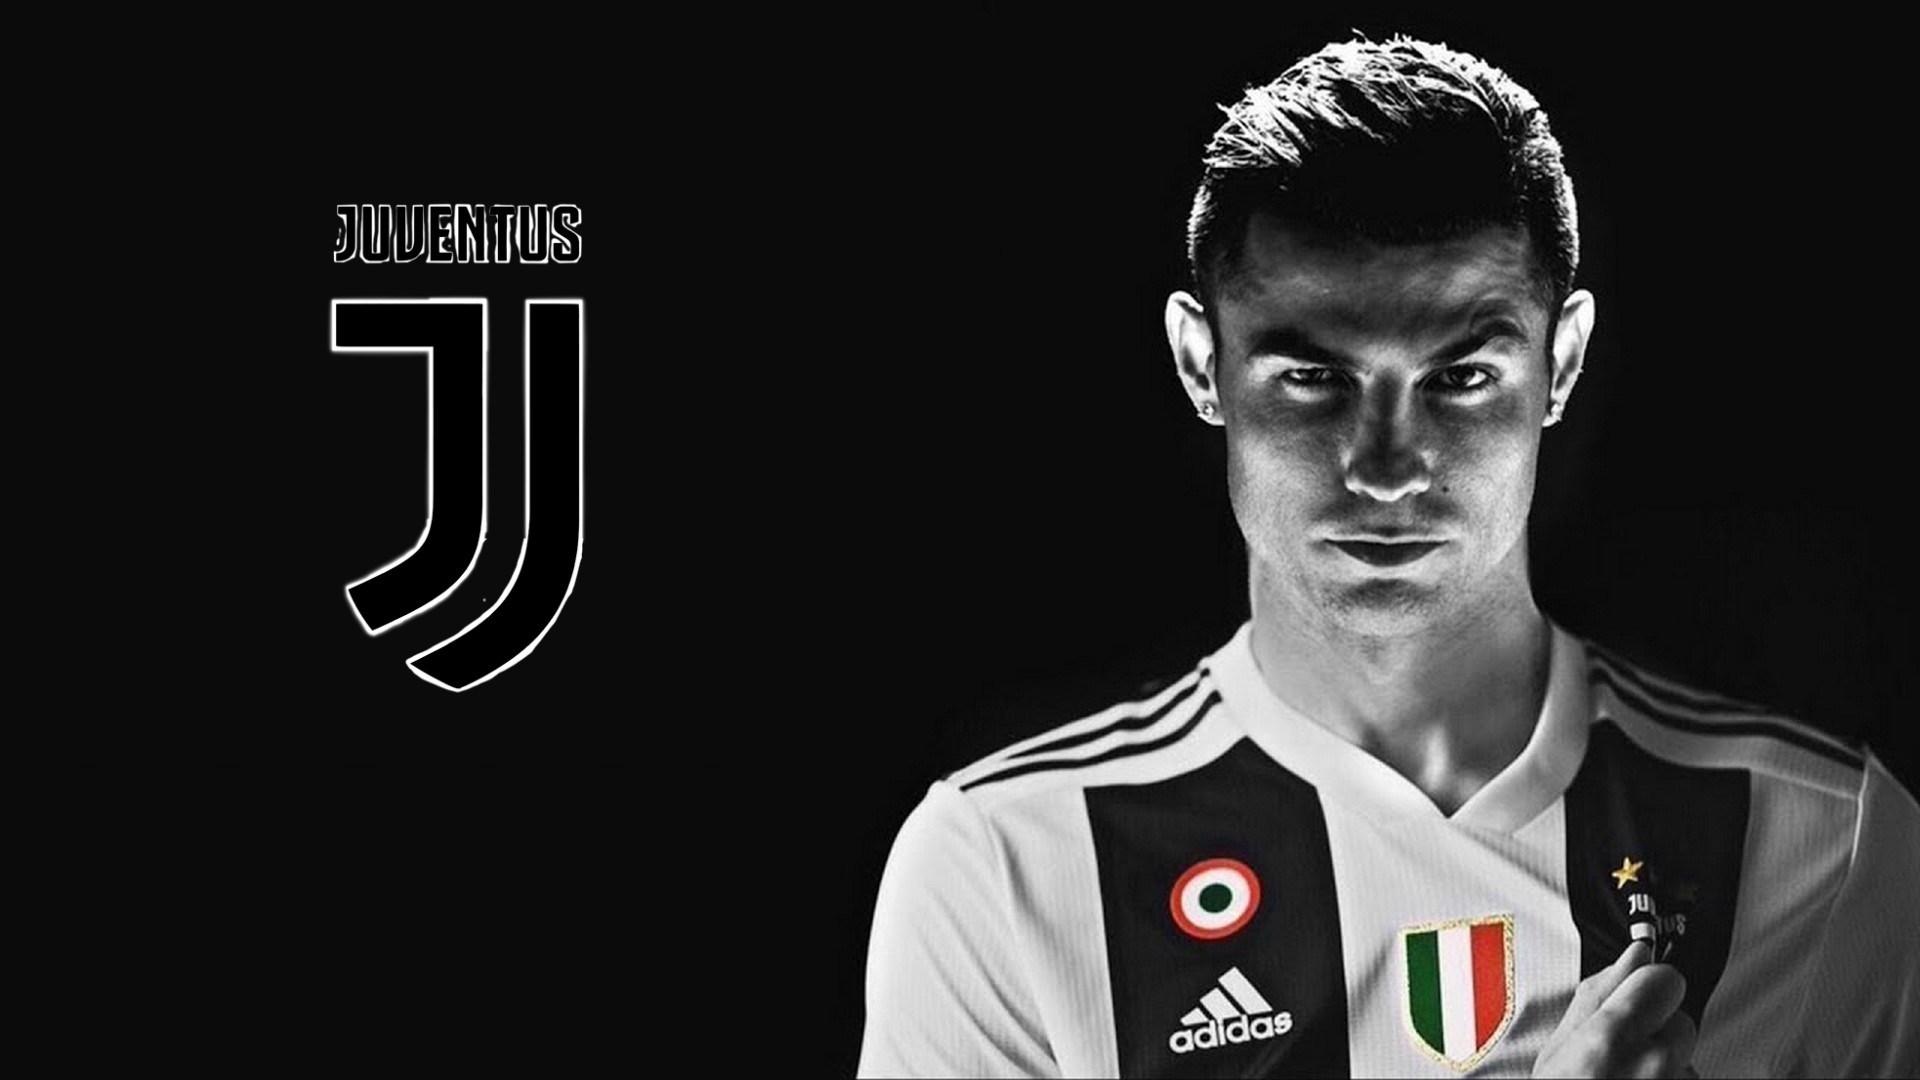 Cristiano Ronaldo Juventus HD Wallpaper 2019 1920x1080